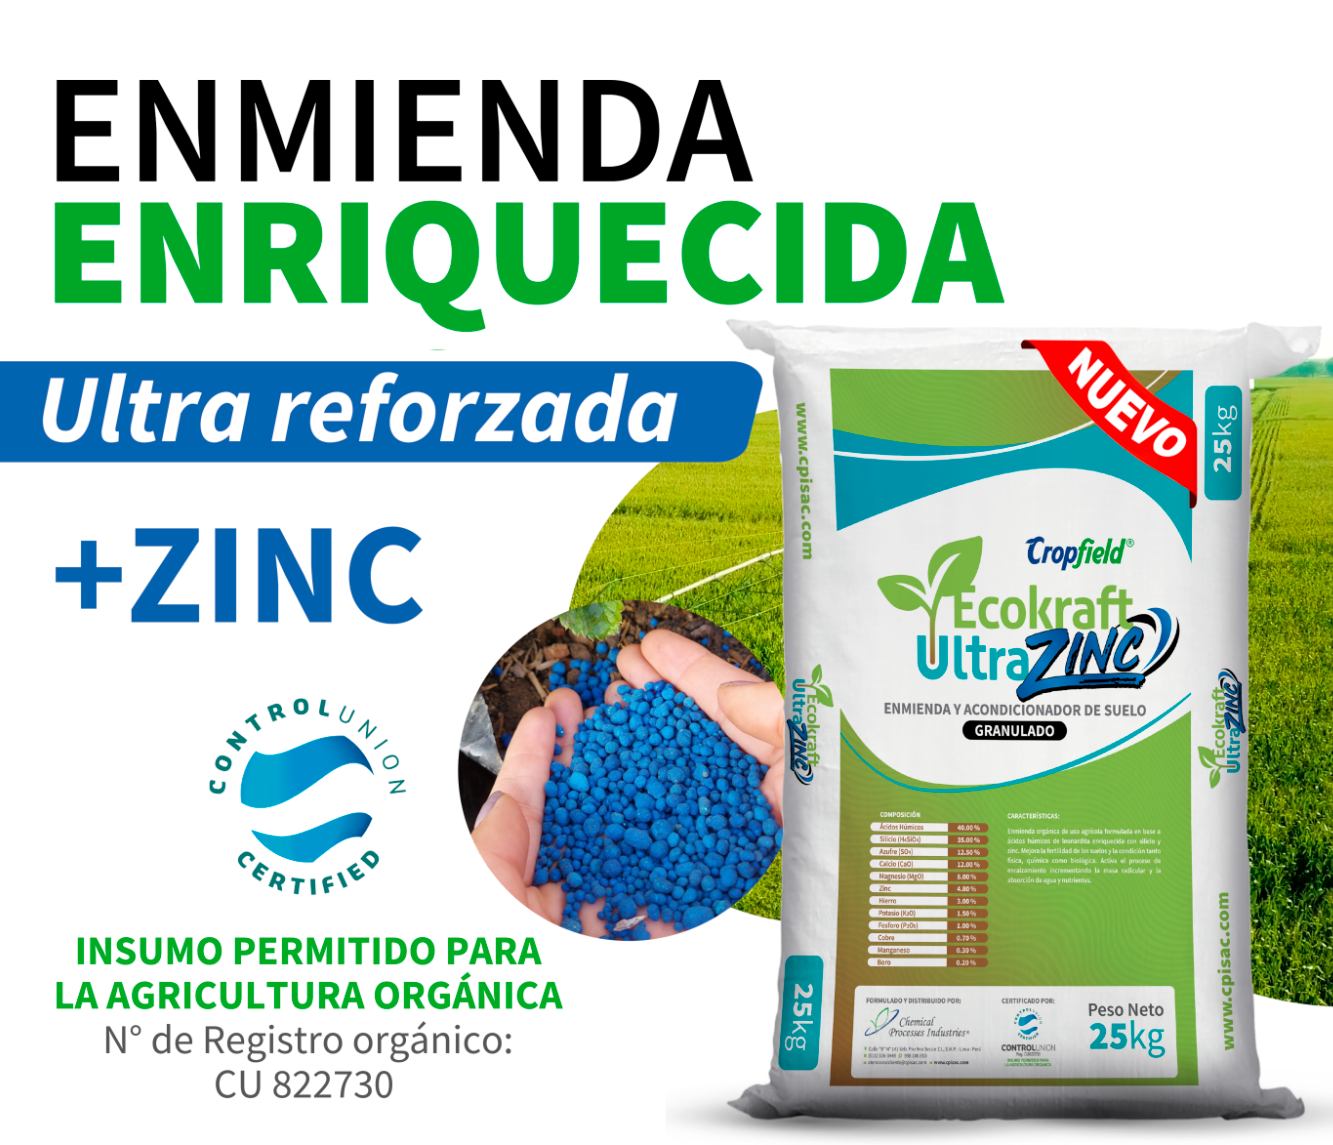 Cropfield Ecokraft UltraZinc